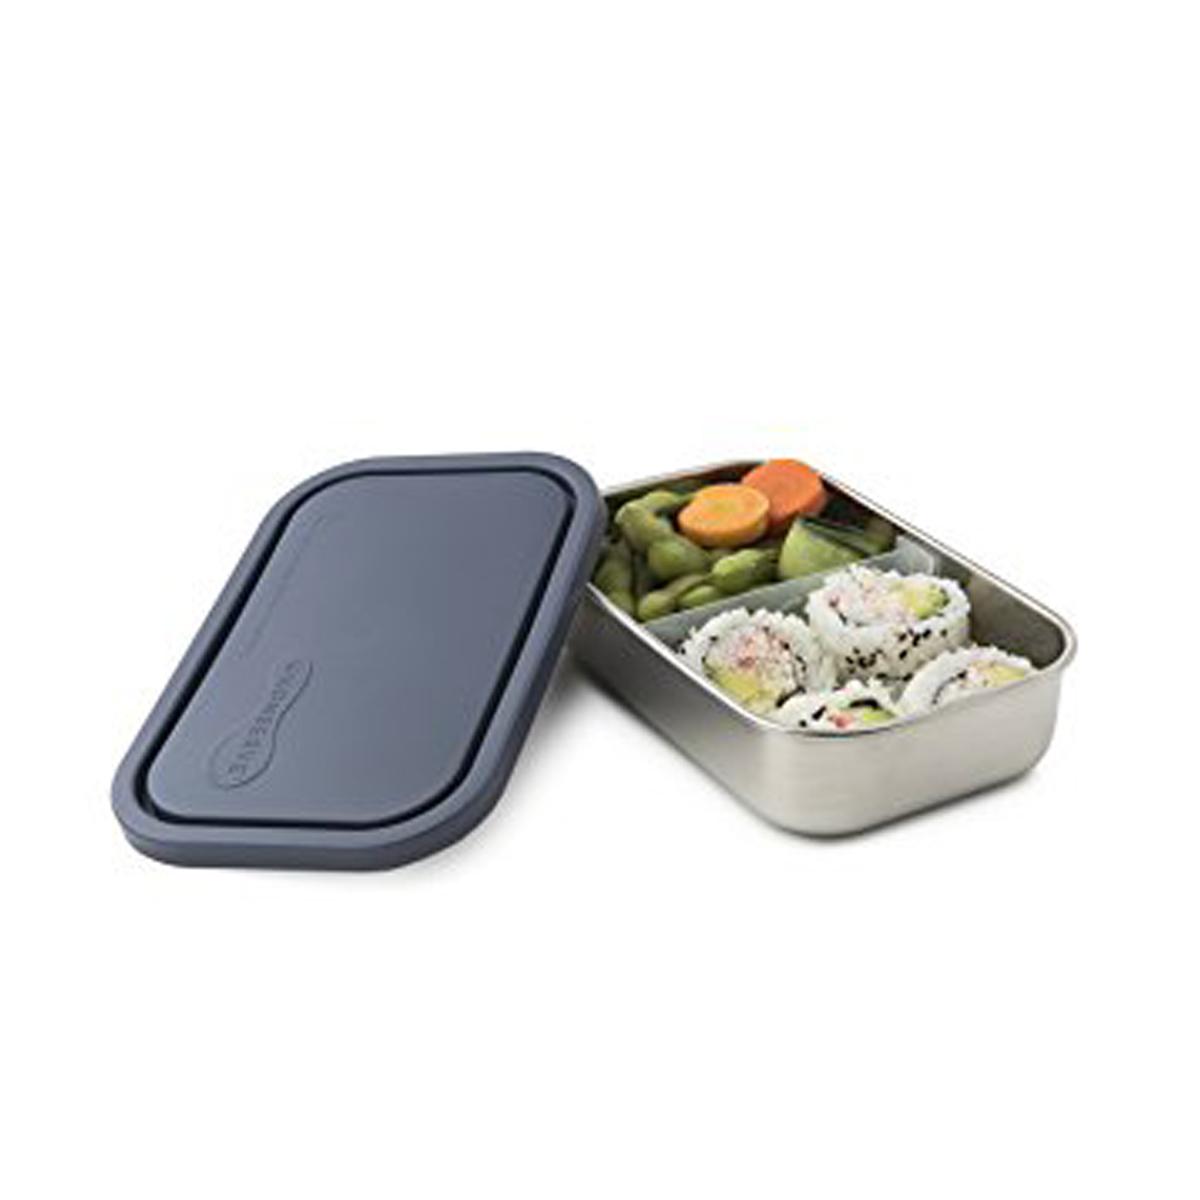 U Konserve Divided Food Container